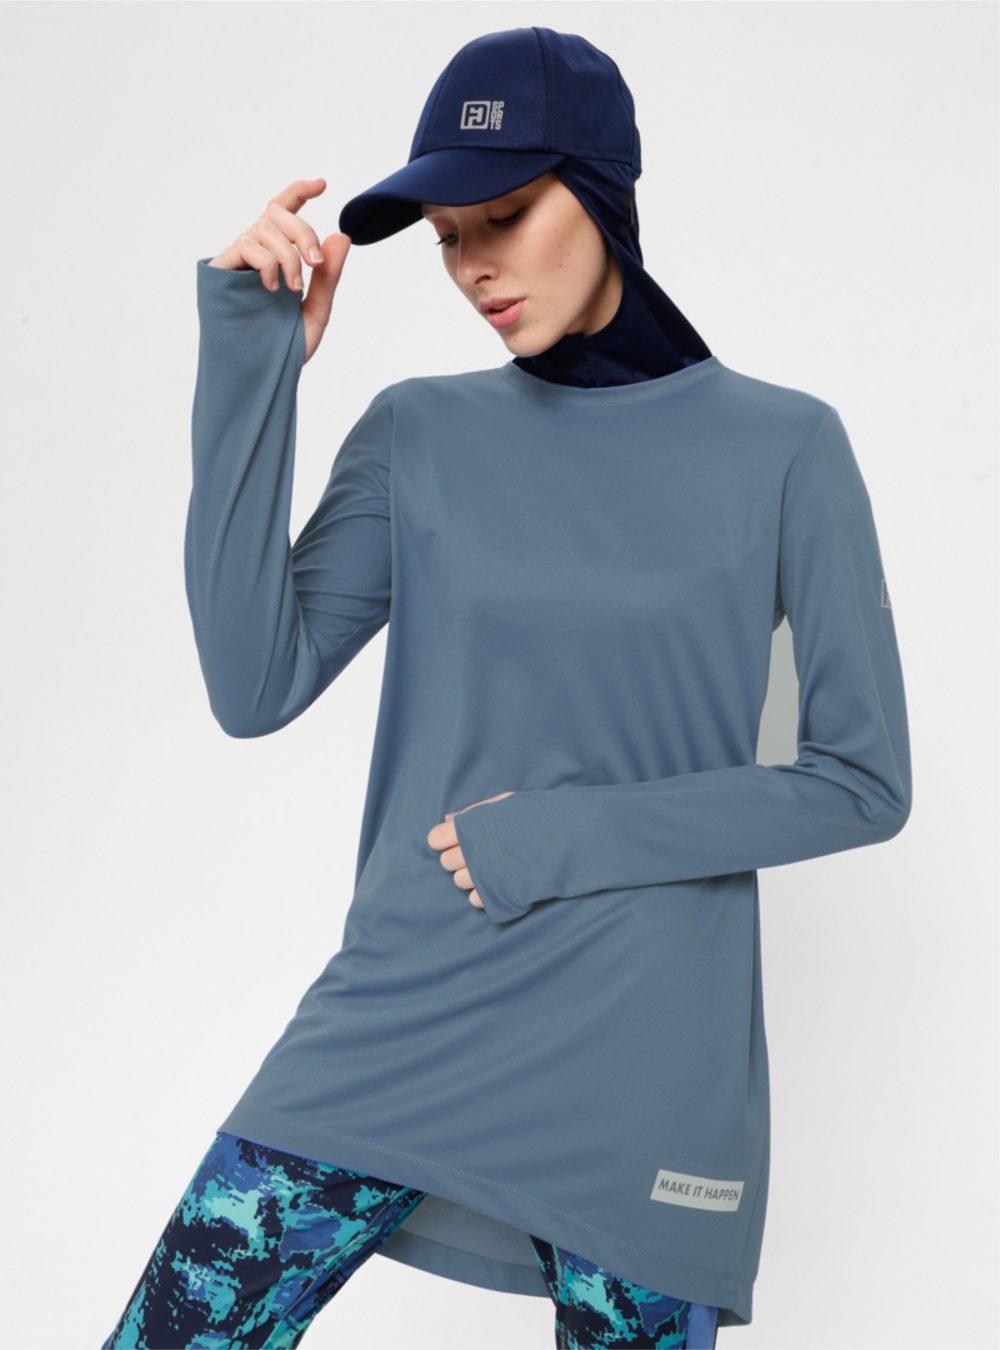 Sweat sport bleu indigo pour femme voilée